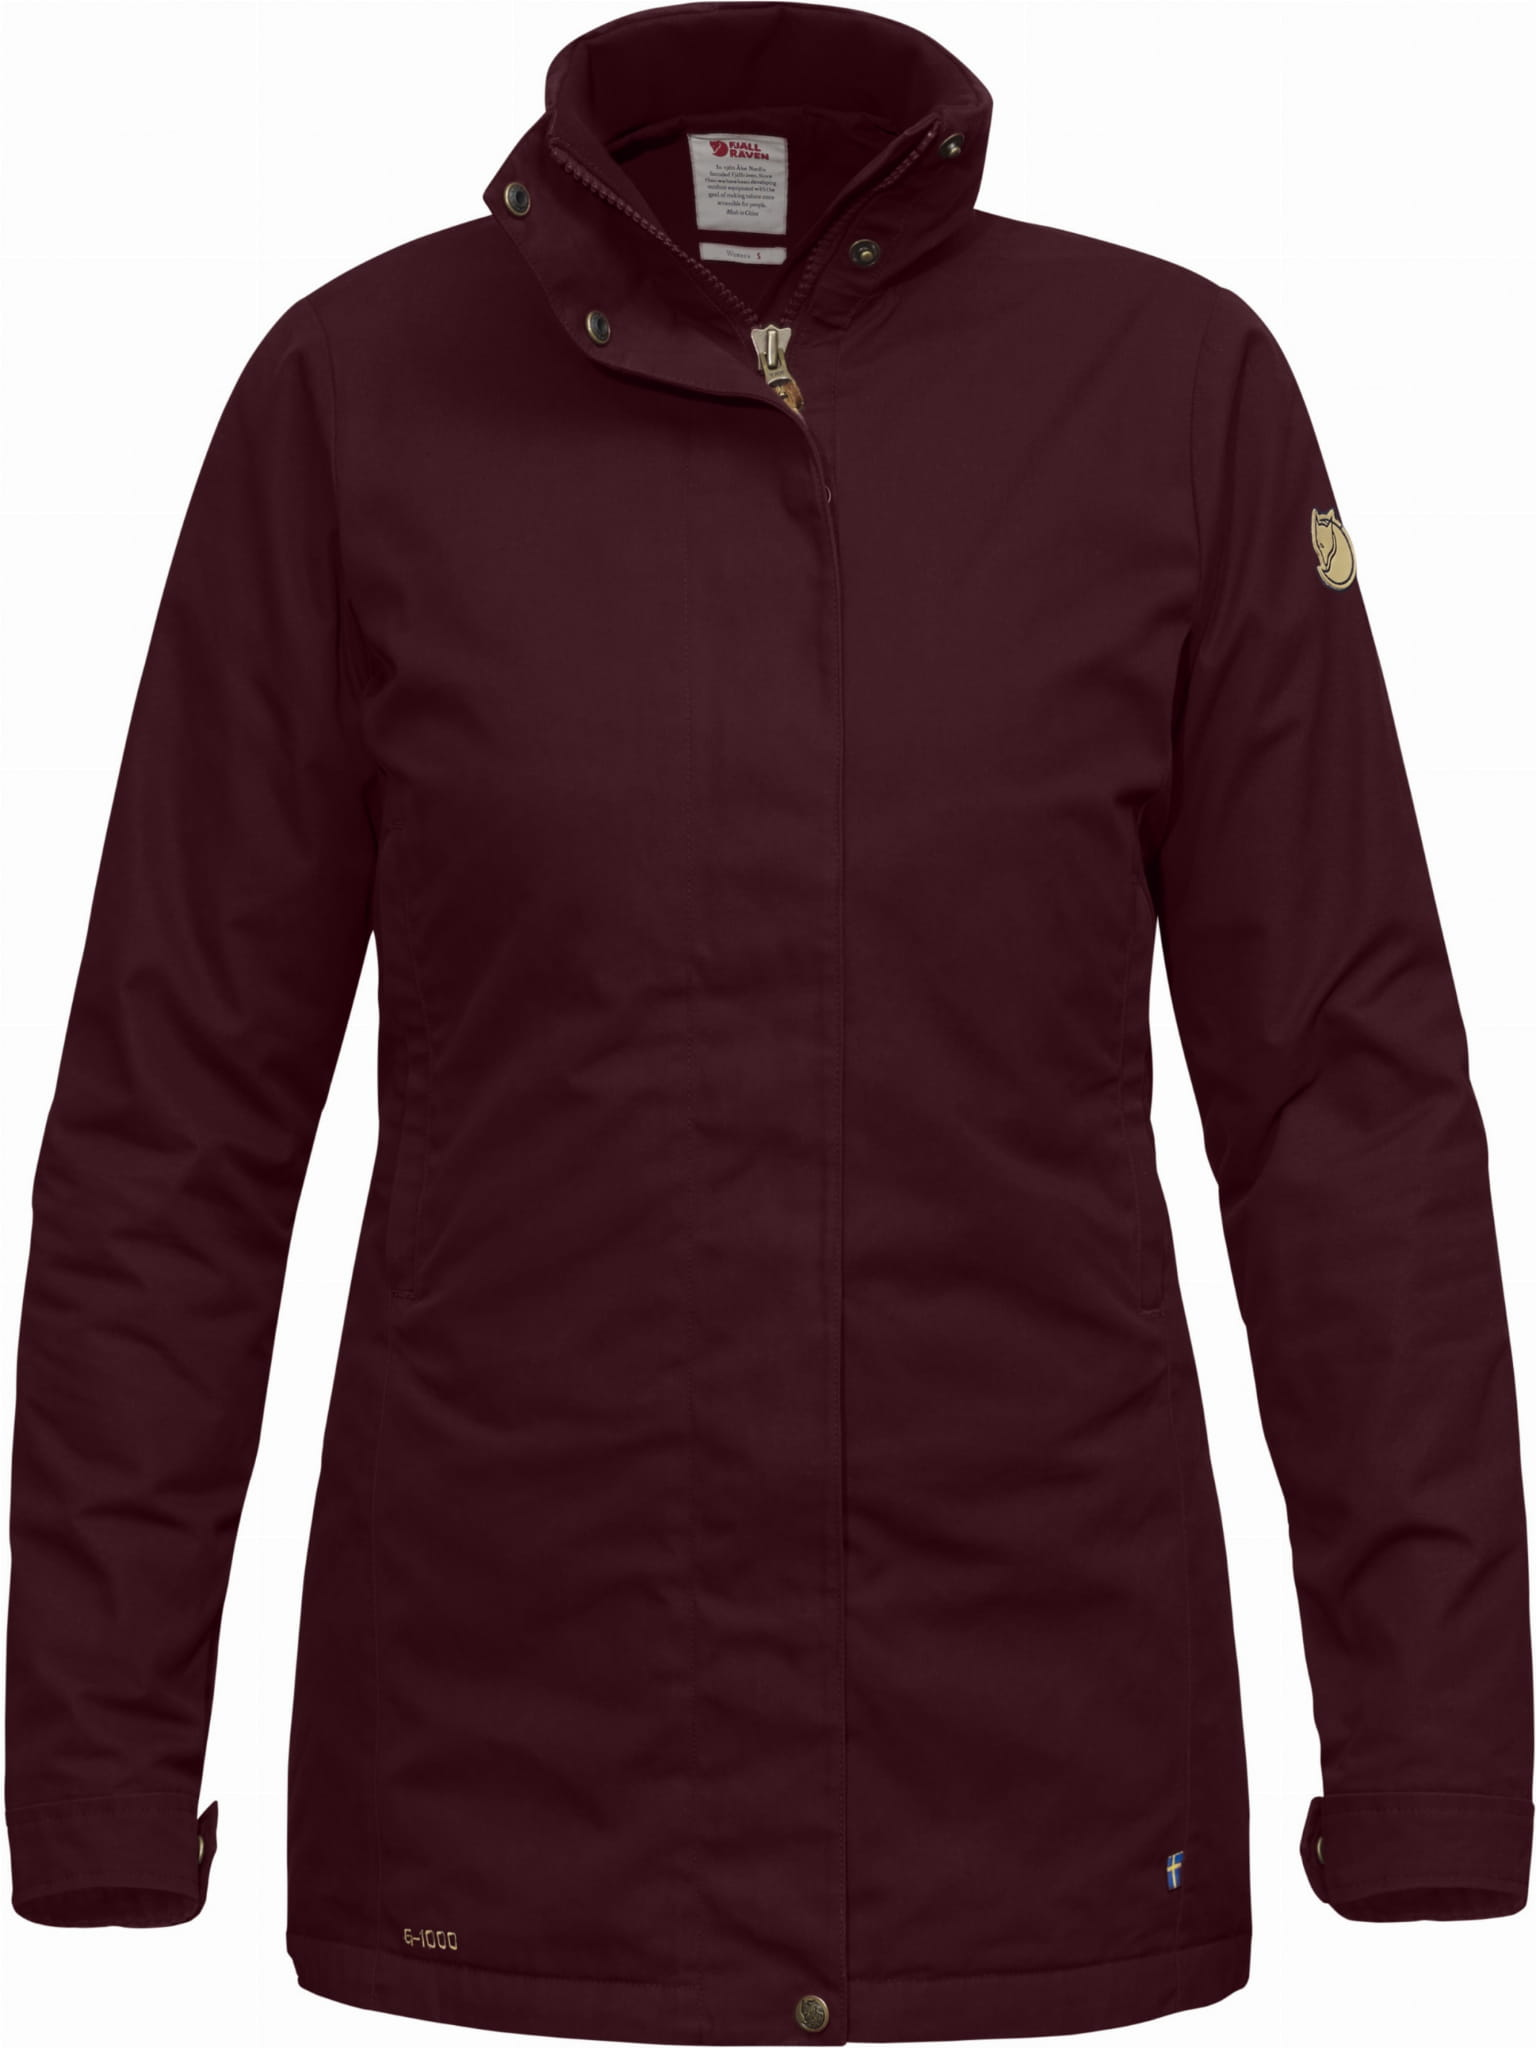 a846494e56c88 ... Sormland Padded Jacket W Fjallraven, kolor: 356- Dark Garnet ...